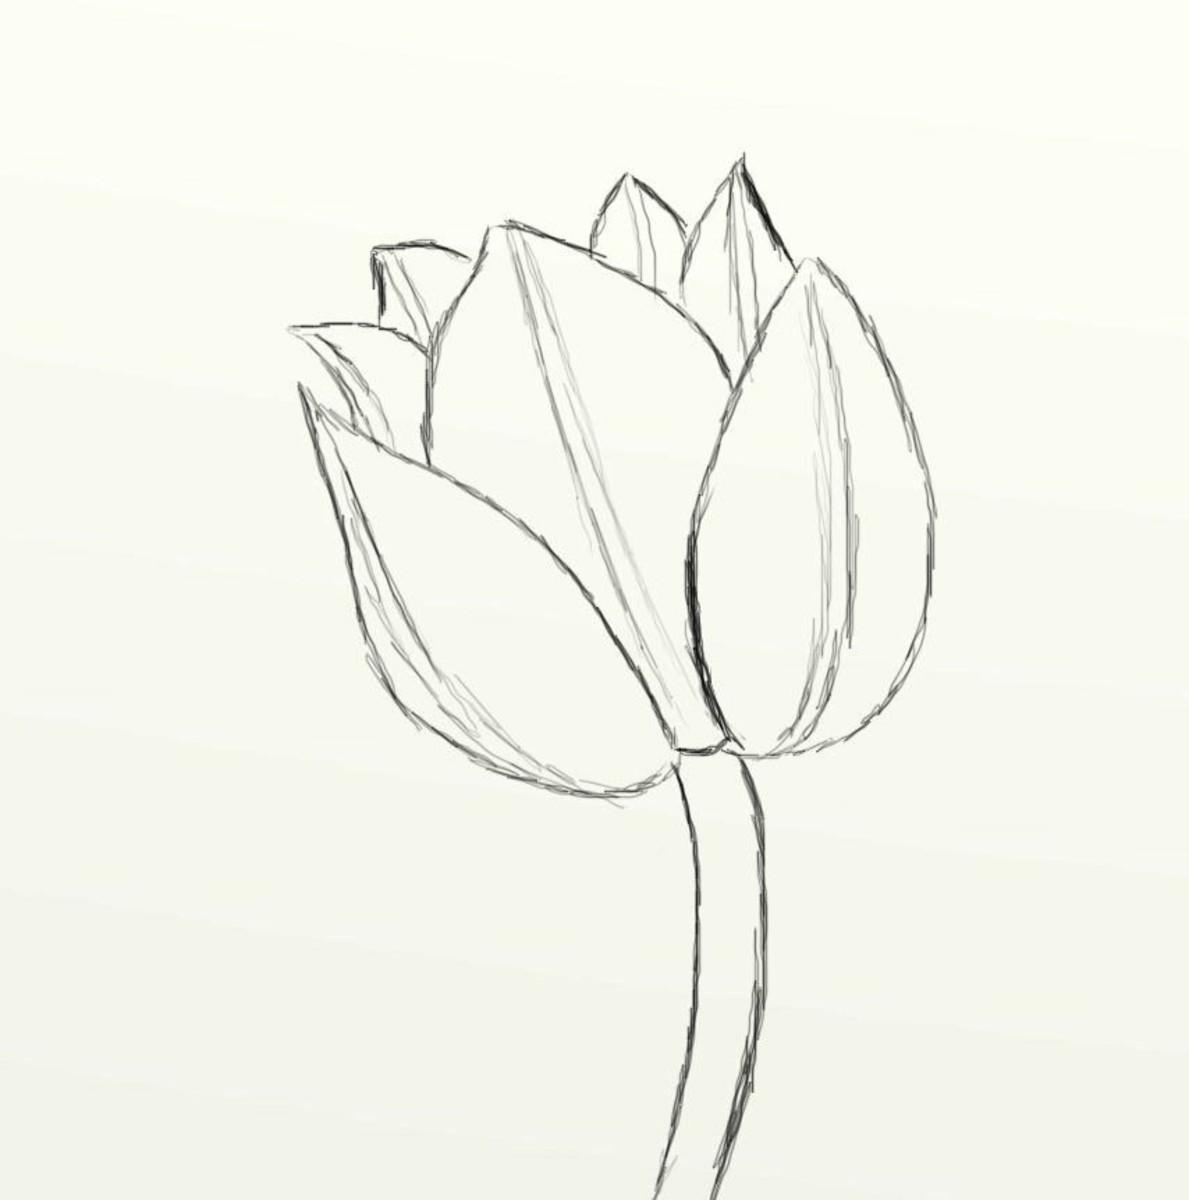 Line Drawing Tulip : Simple tulip drawings imgkid the image kid has it